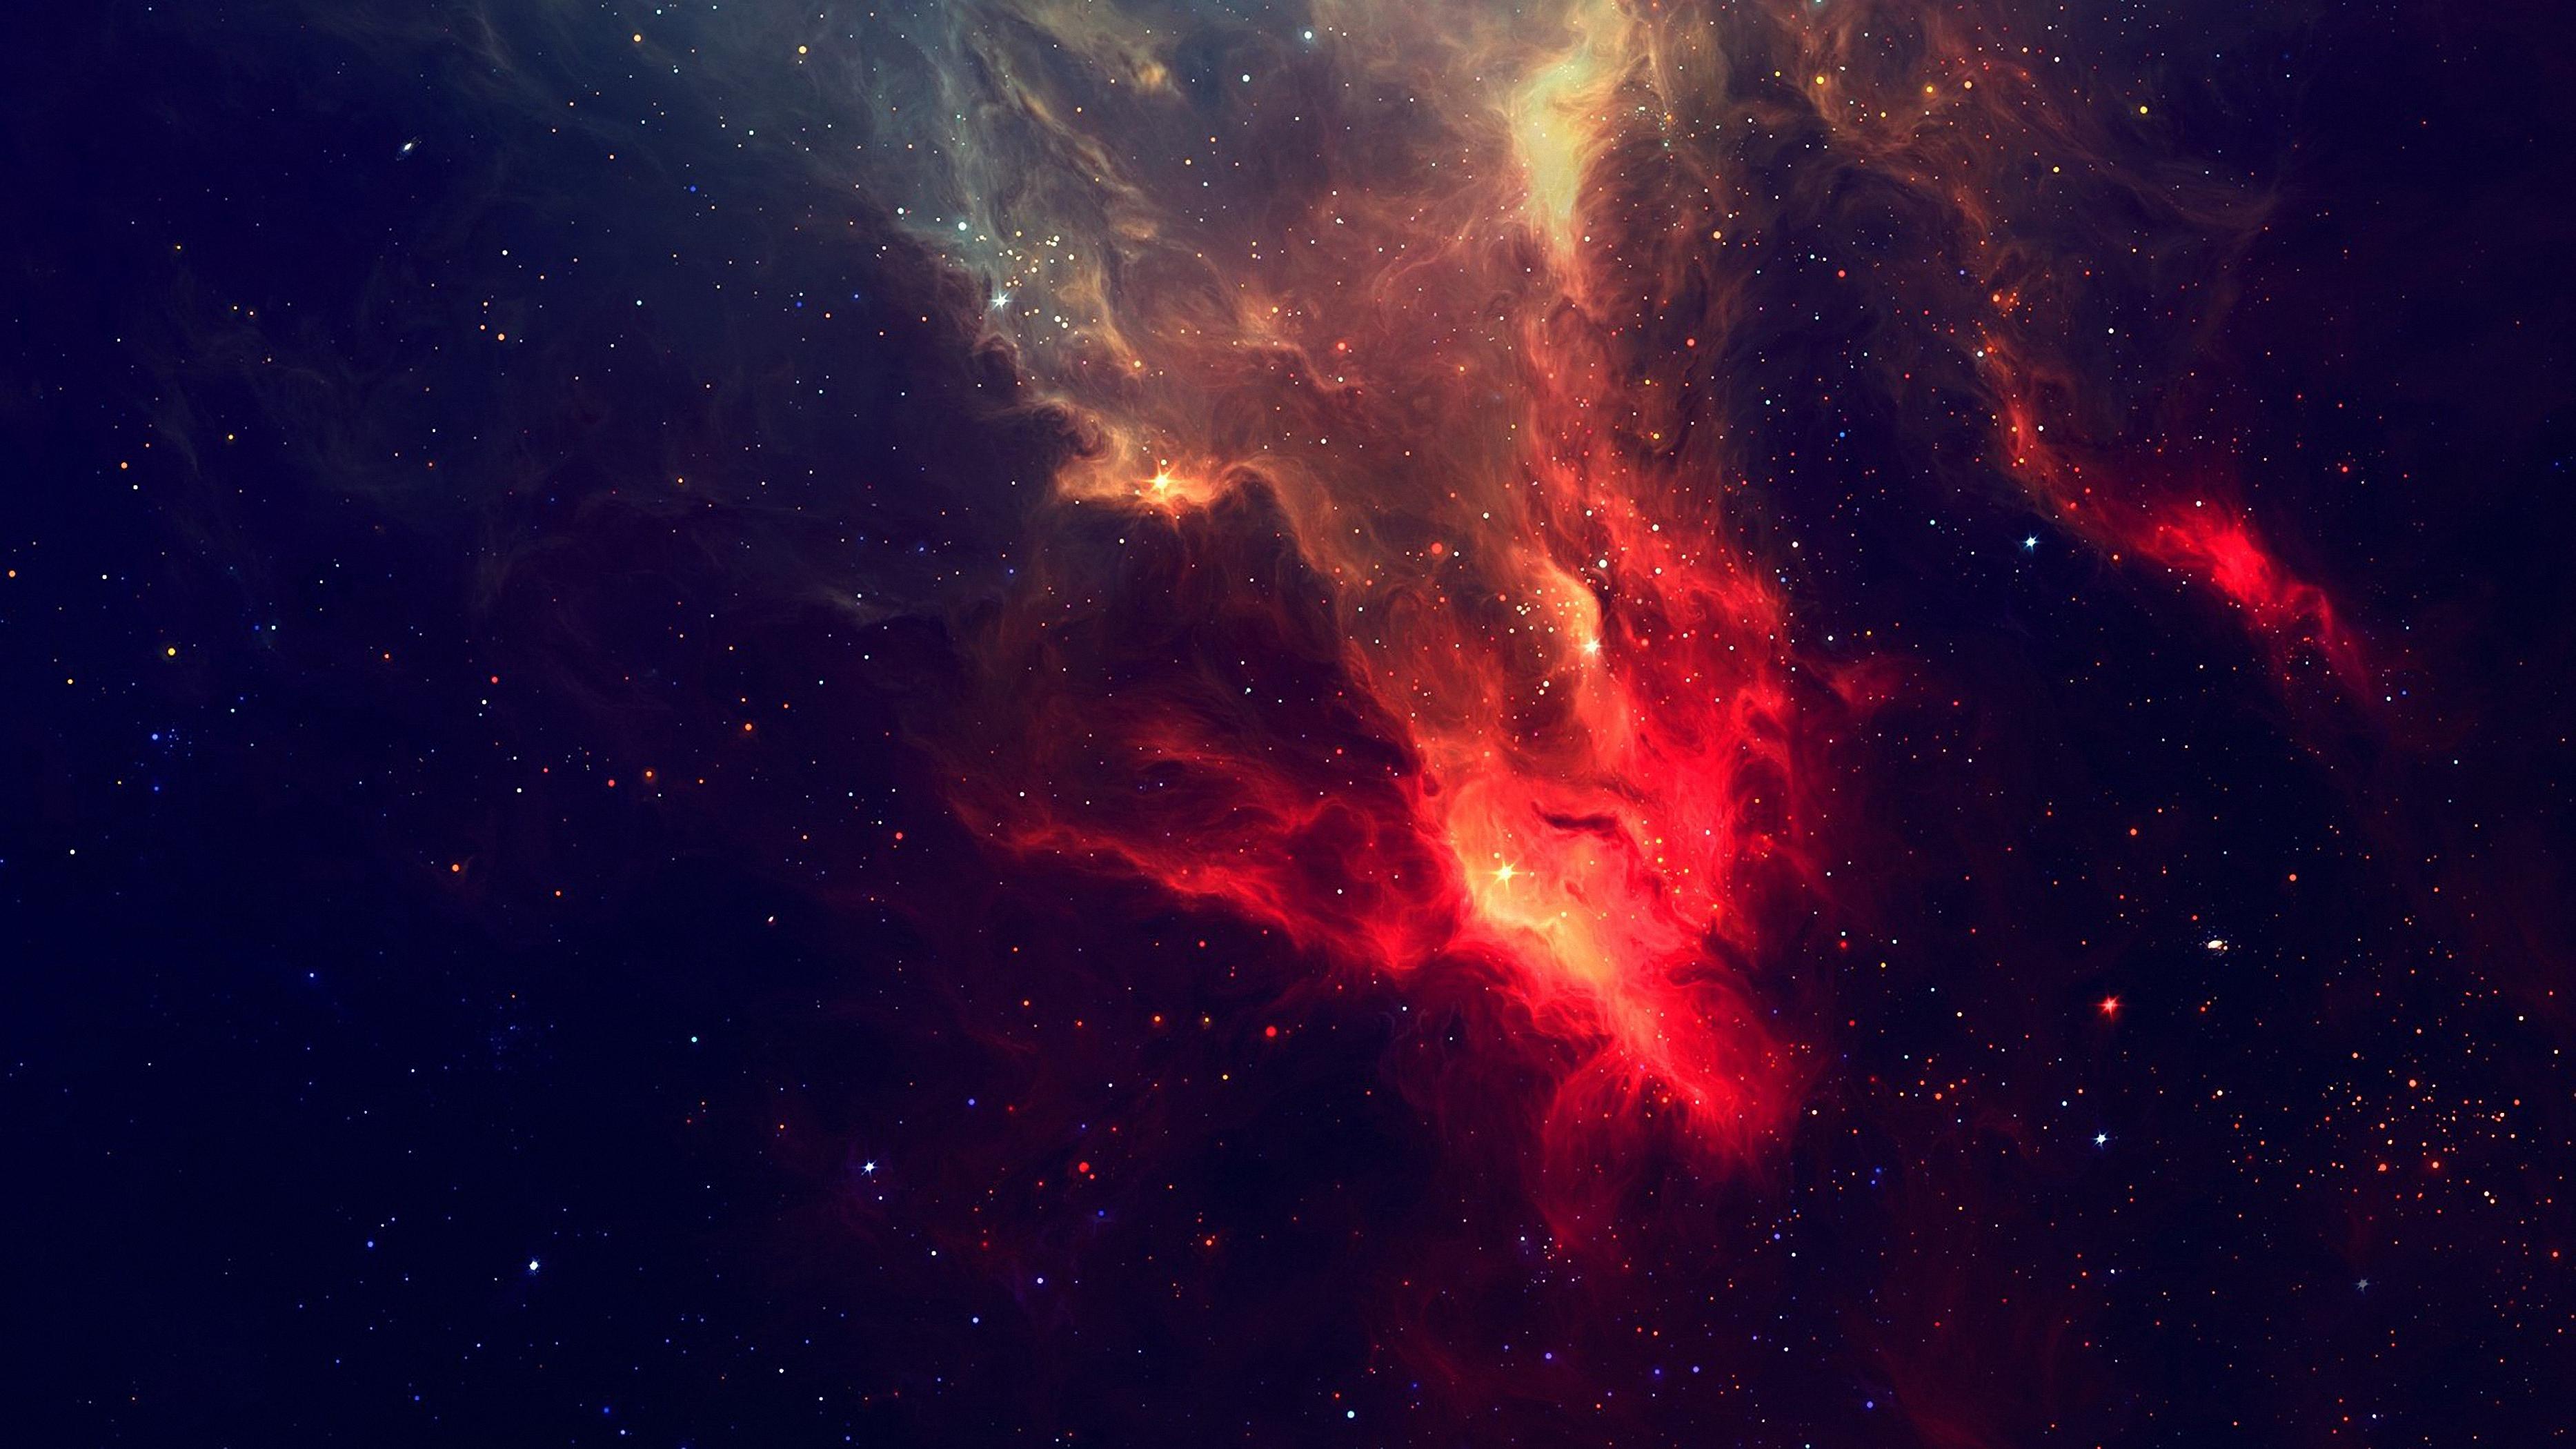 download nebula for windows 107818 6432 bits - HD3734×2100